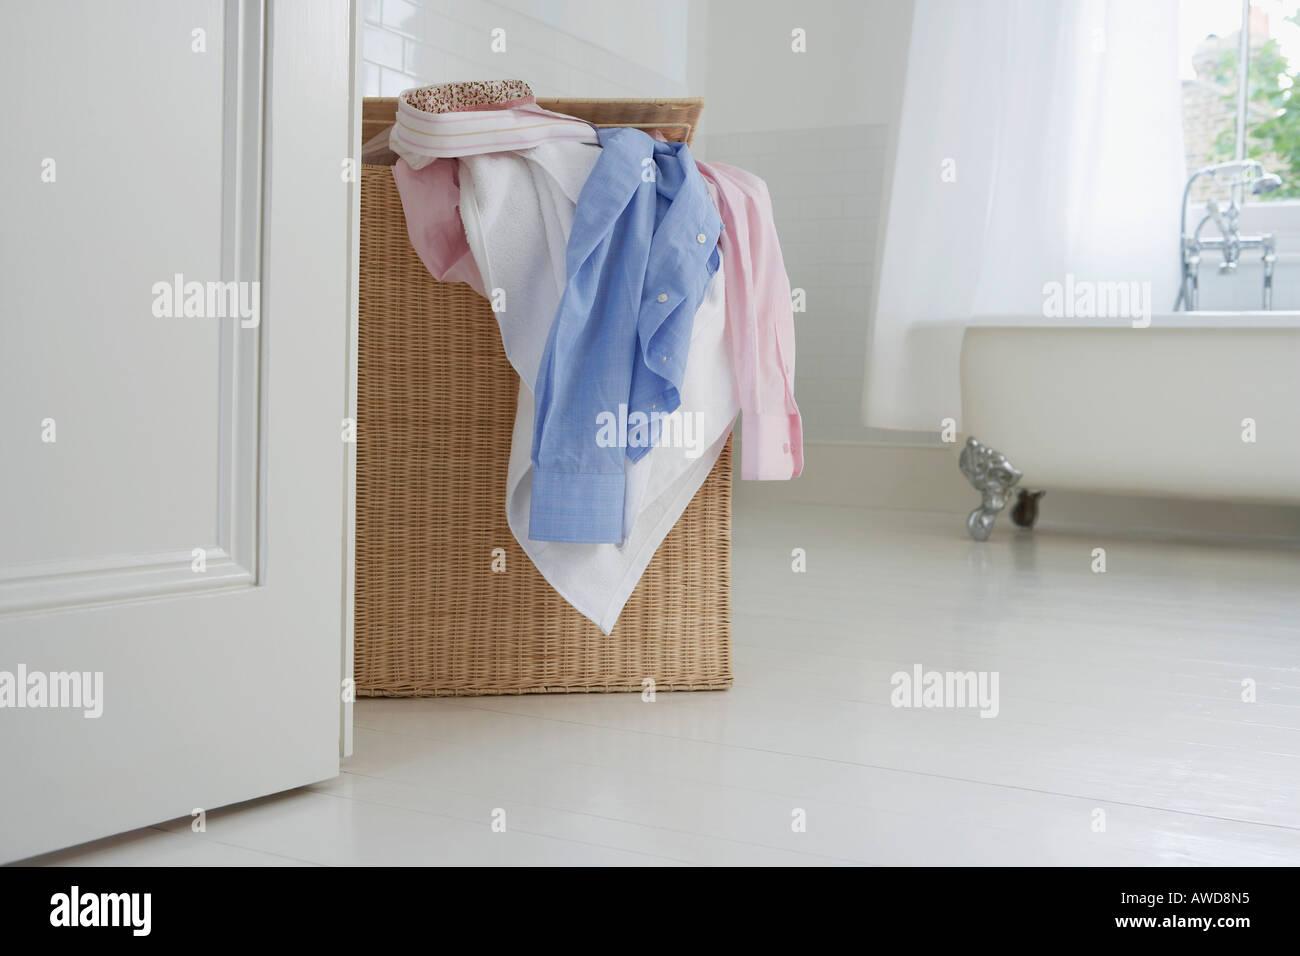 Overflowing laundry basket in bathroom - Stock Image